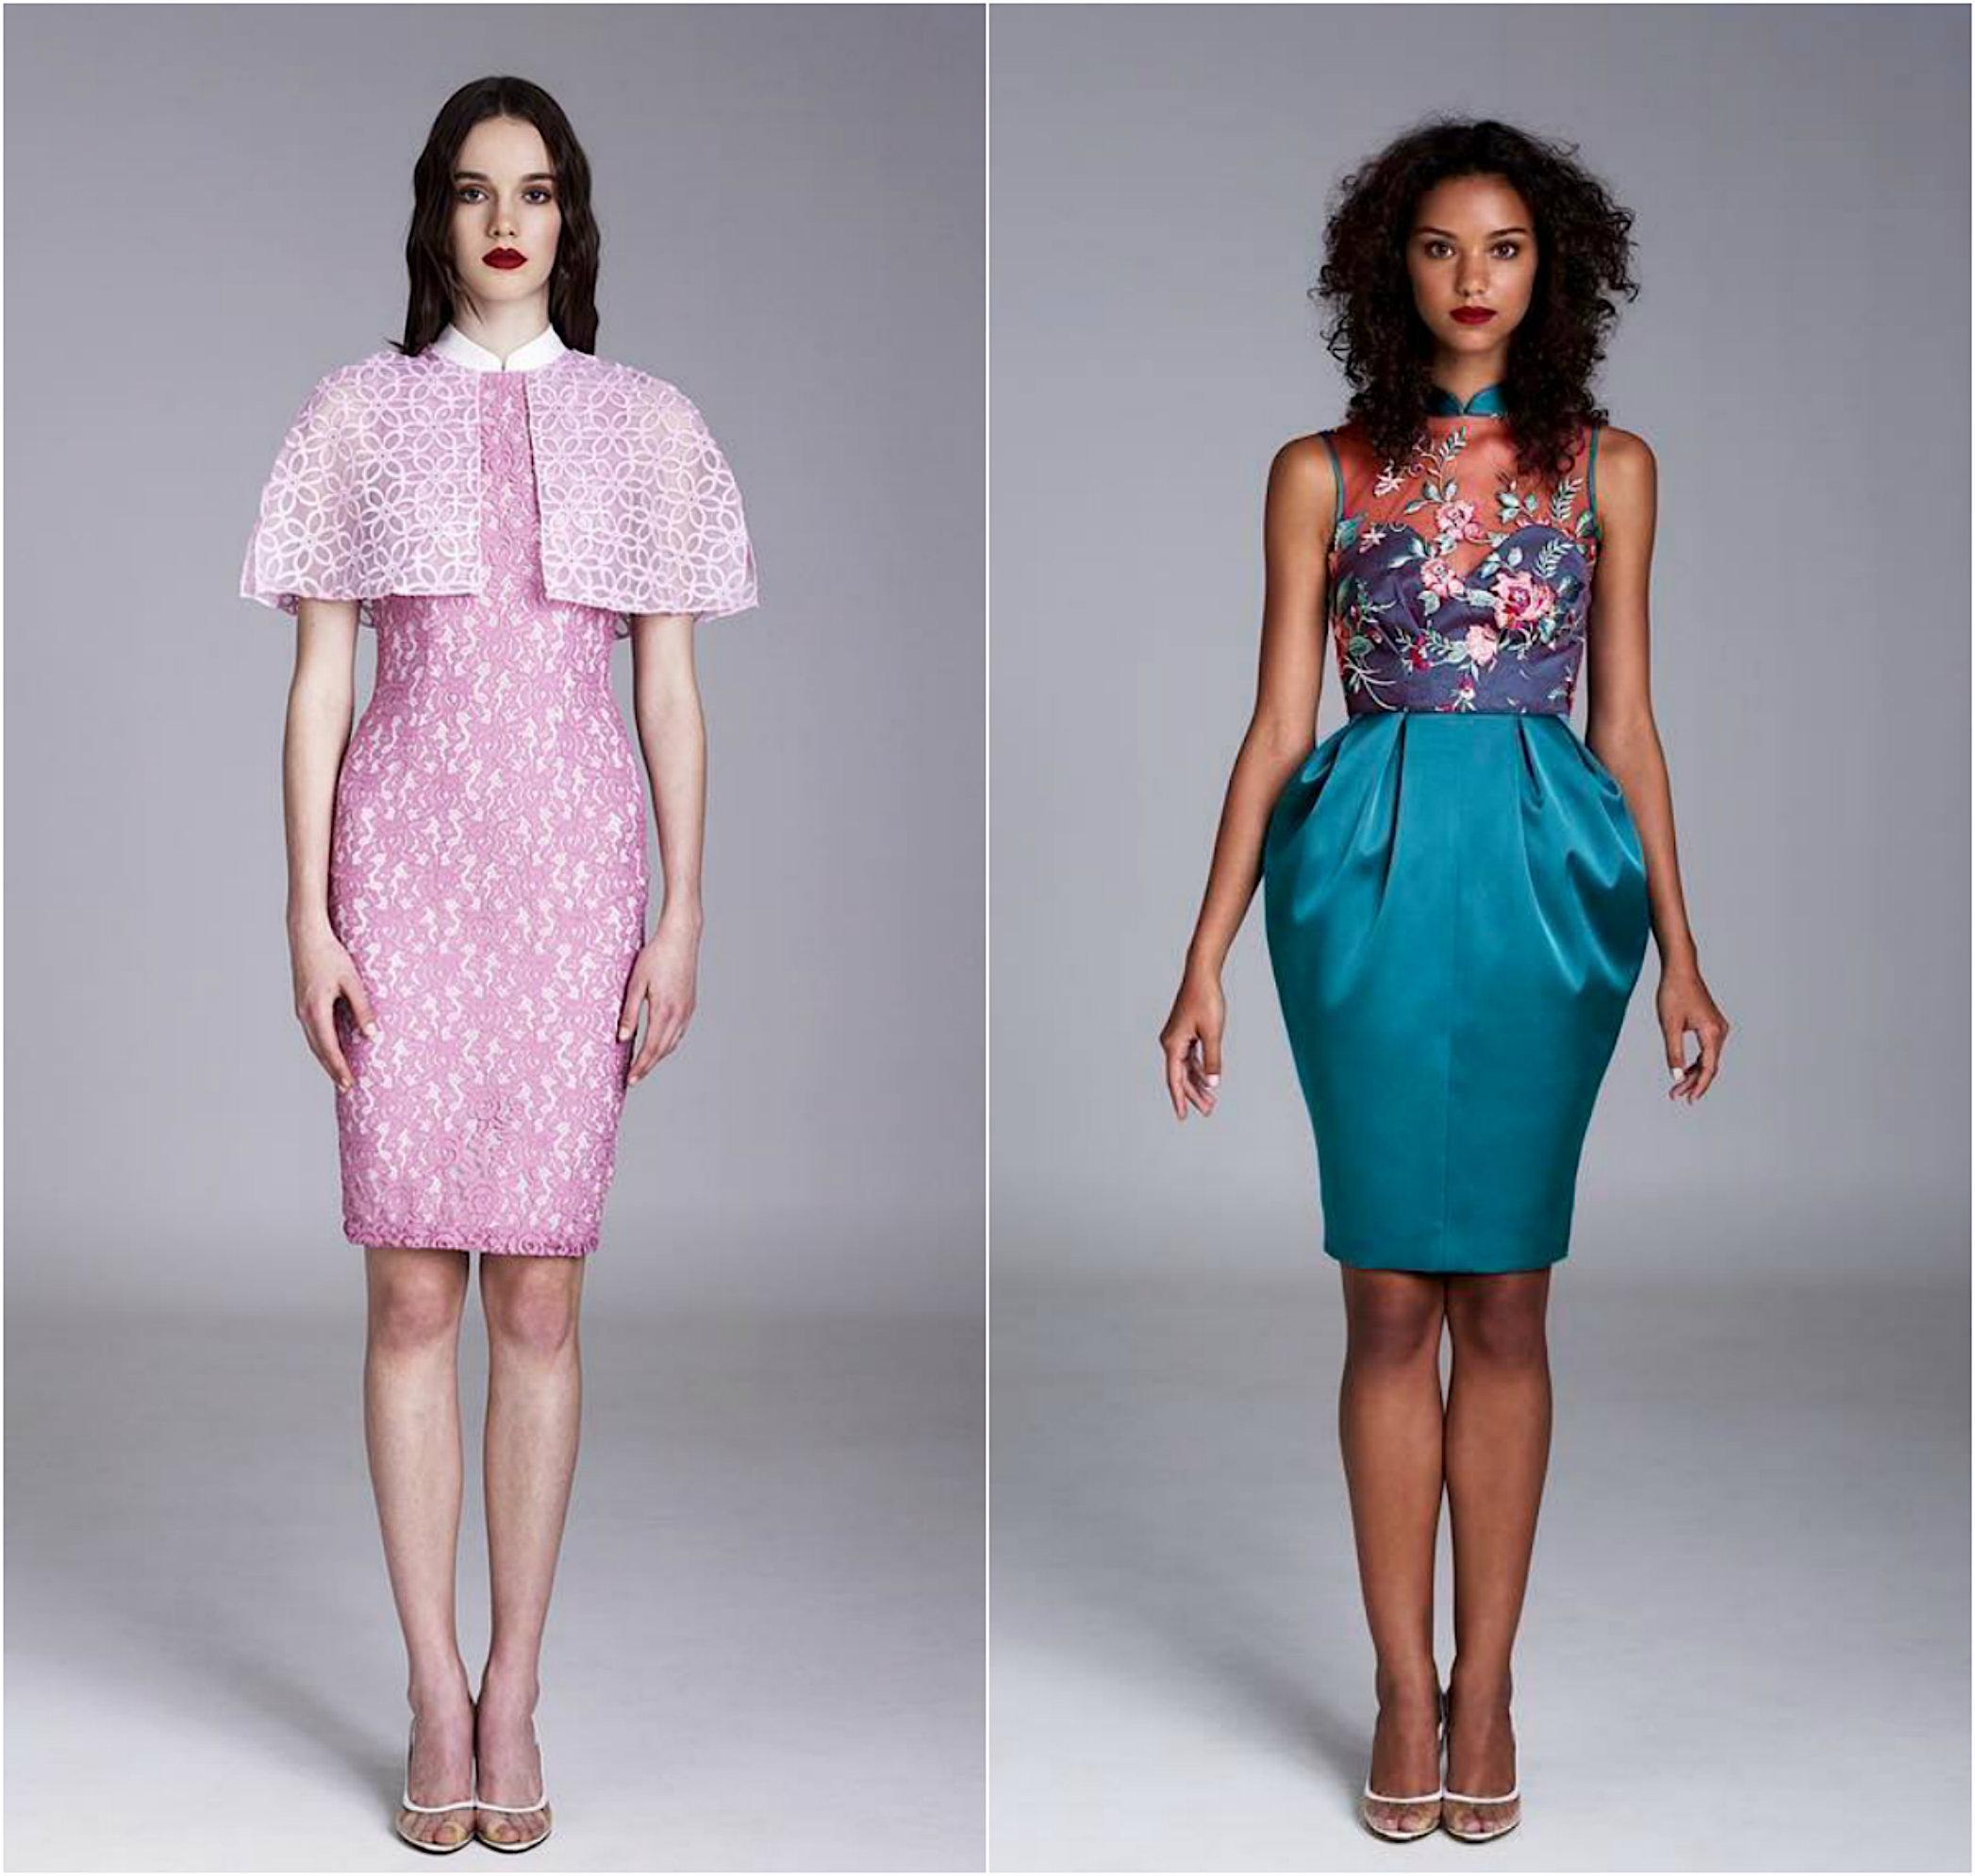 Singapore fashion labels: Ong Shumugam